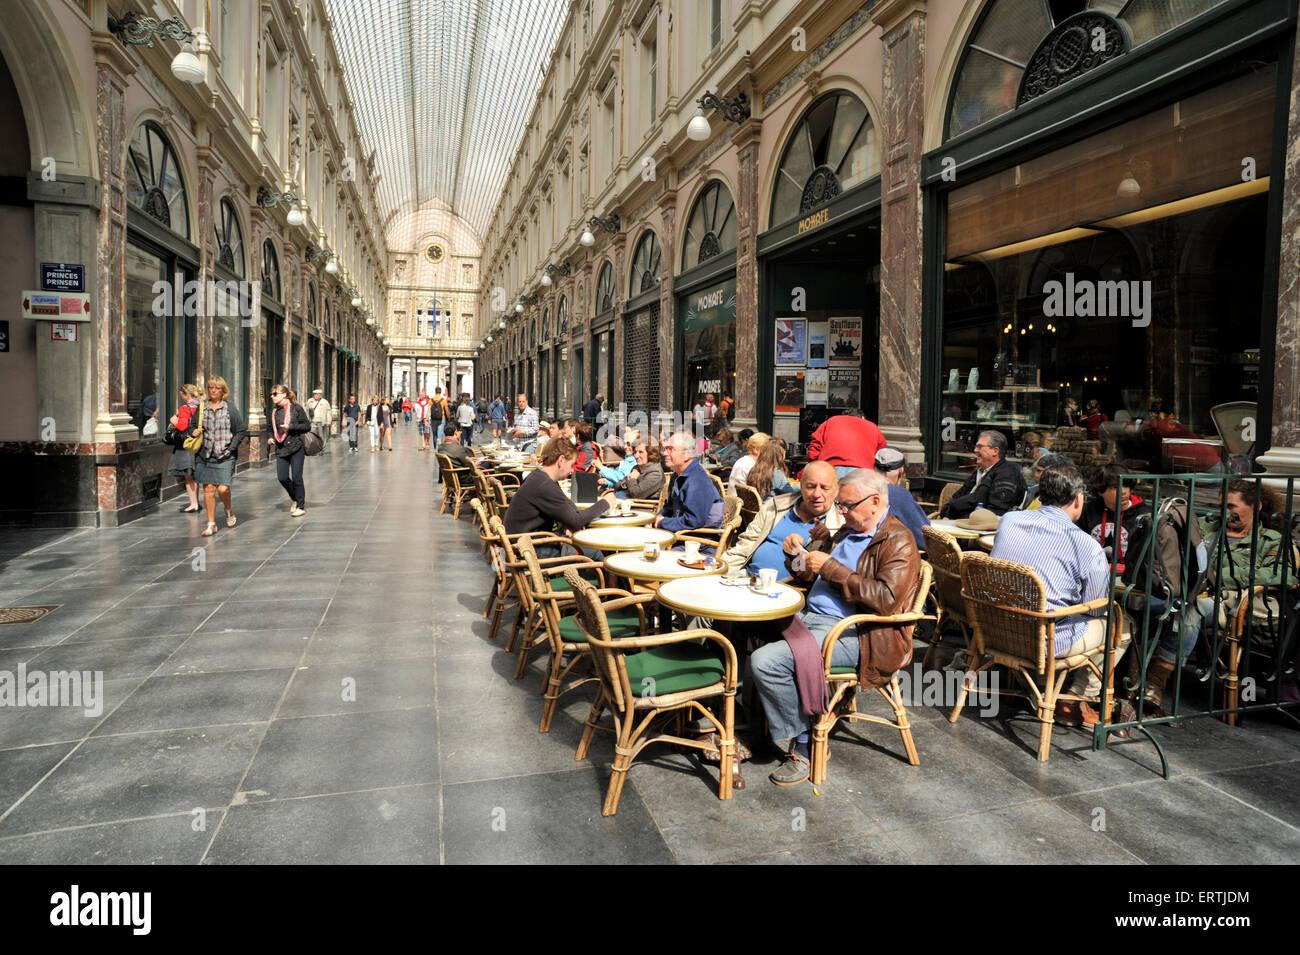 belgium, brussels, galeries saint-hubert - Stock Image